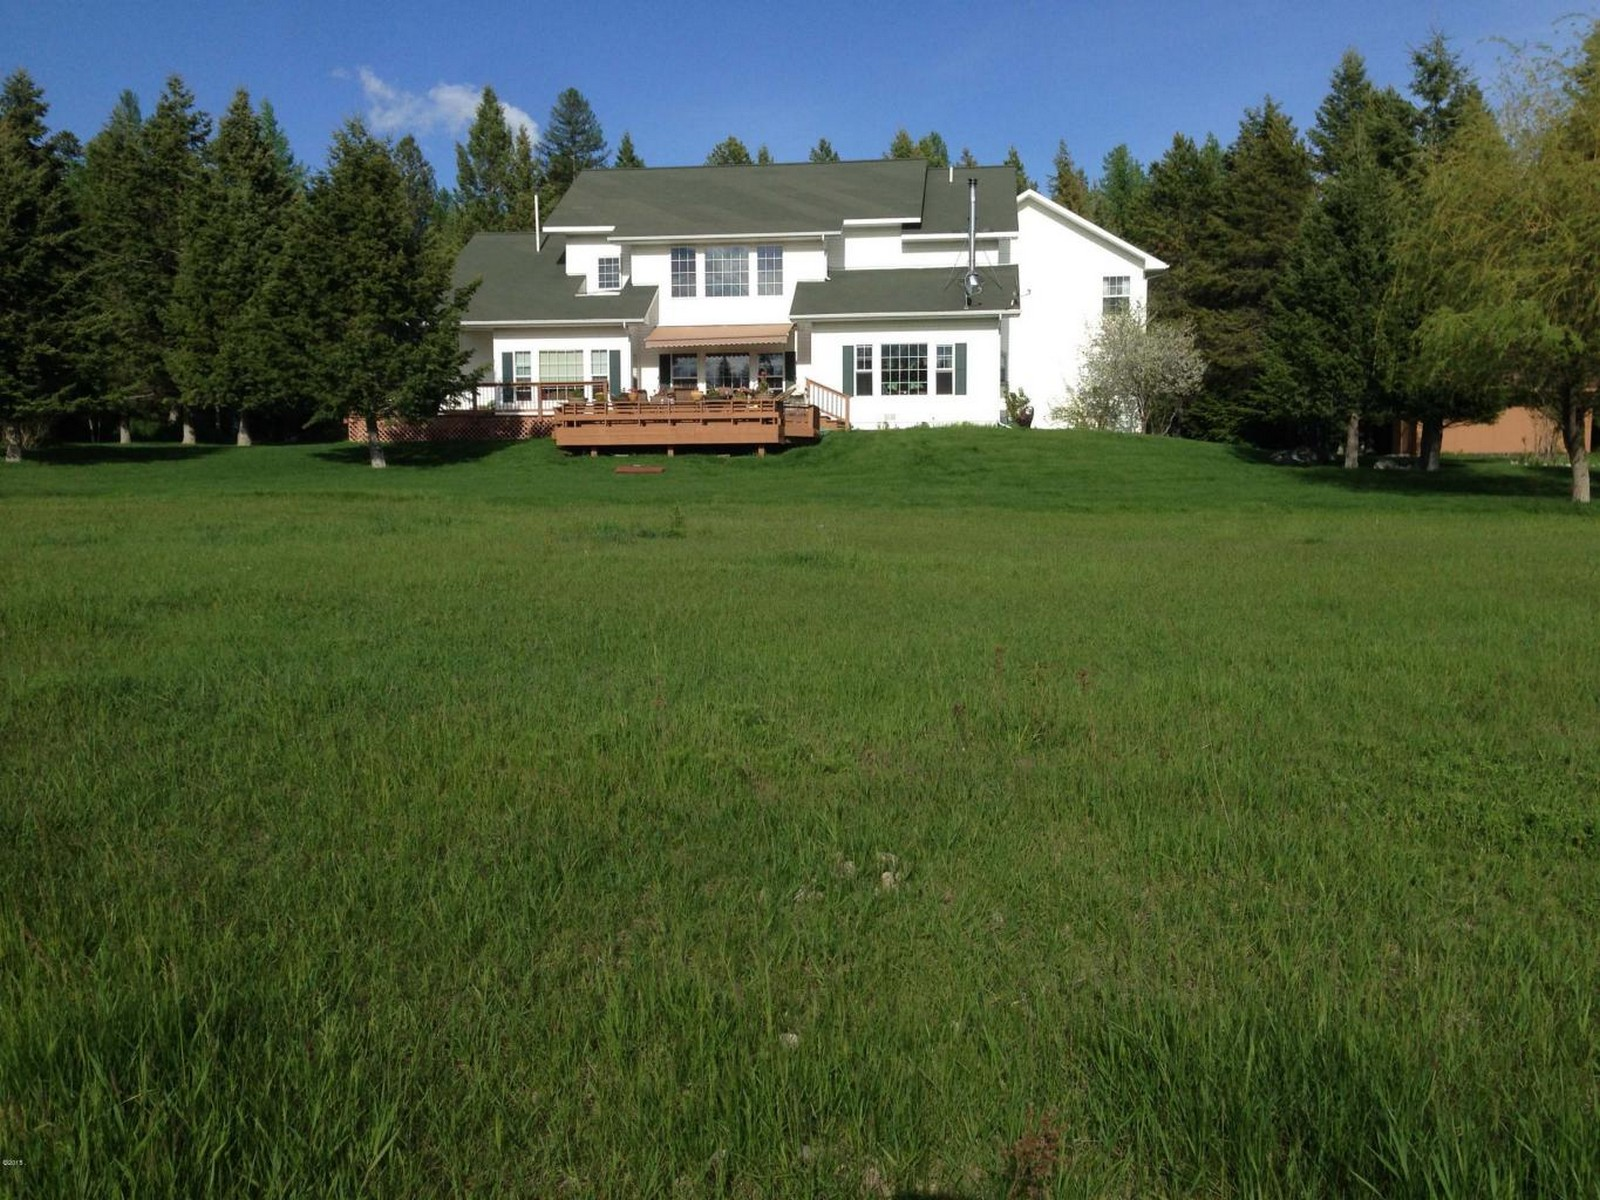 獨棟家庭住宅 為 出售 在 186 E Blanchard Lake Rd , Whitefish, MT 59937 Whitefish, 蒙大拿州, 59937 美國